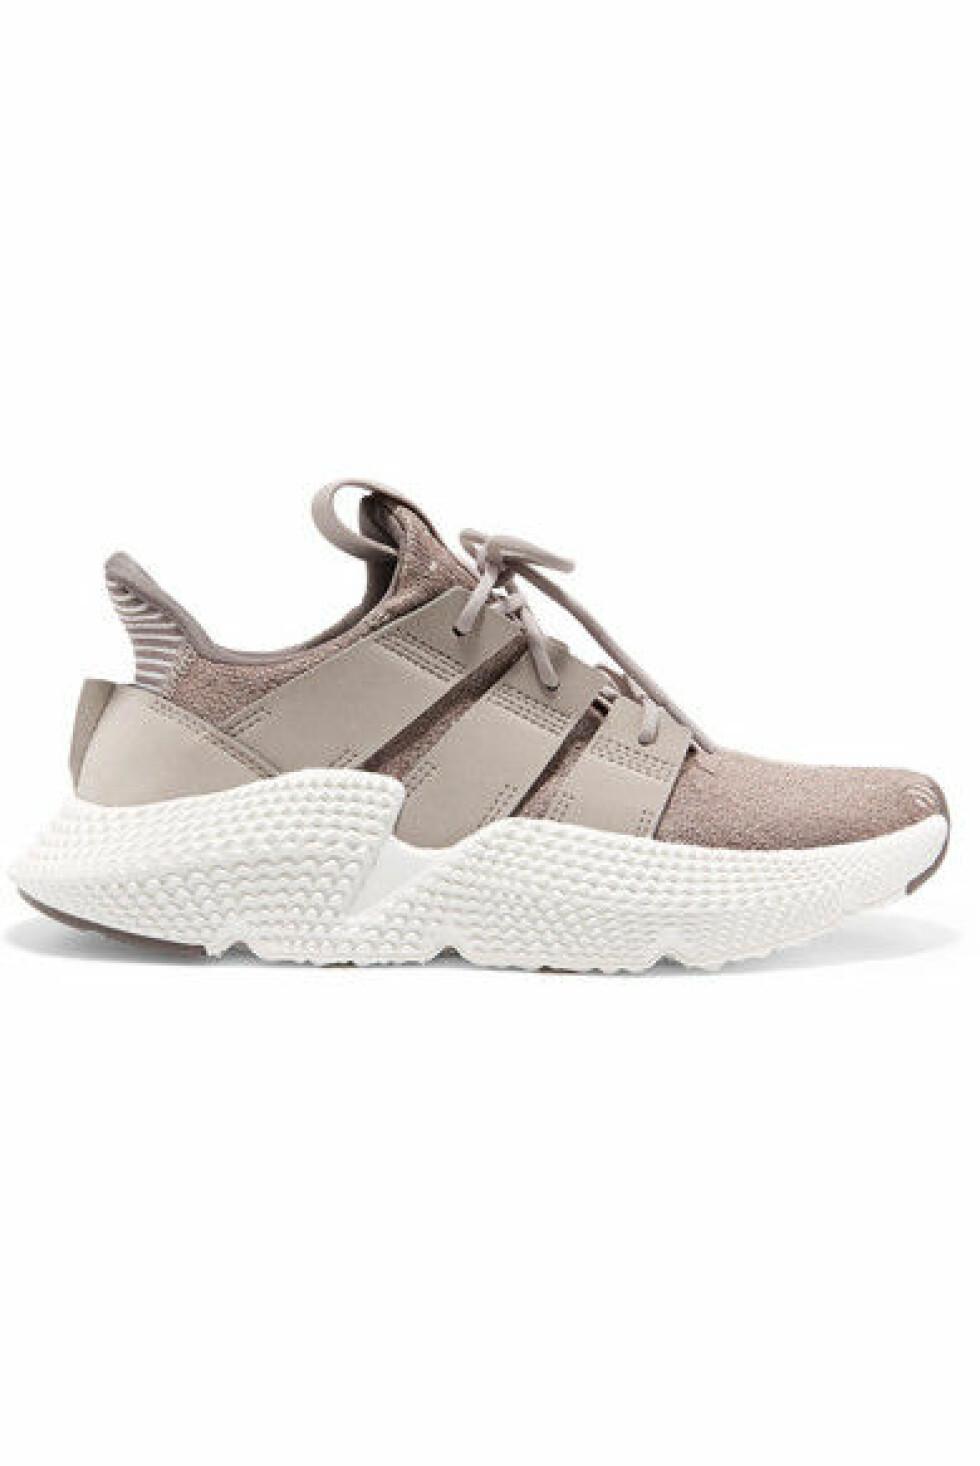 Sko fra Adidas |1015,-|https://www.net-a-porter.com/no/en/product/1050793/adidas_originals/prophere-stretch-knit-sneakers